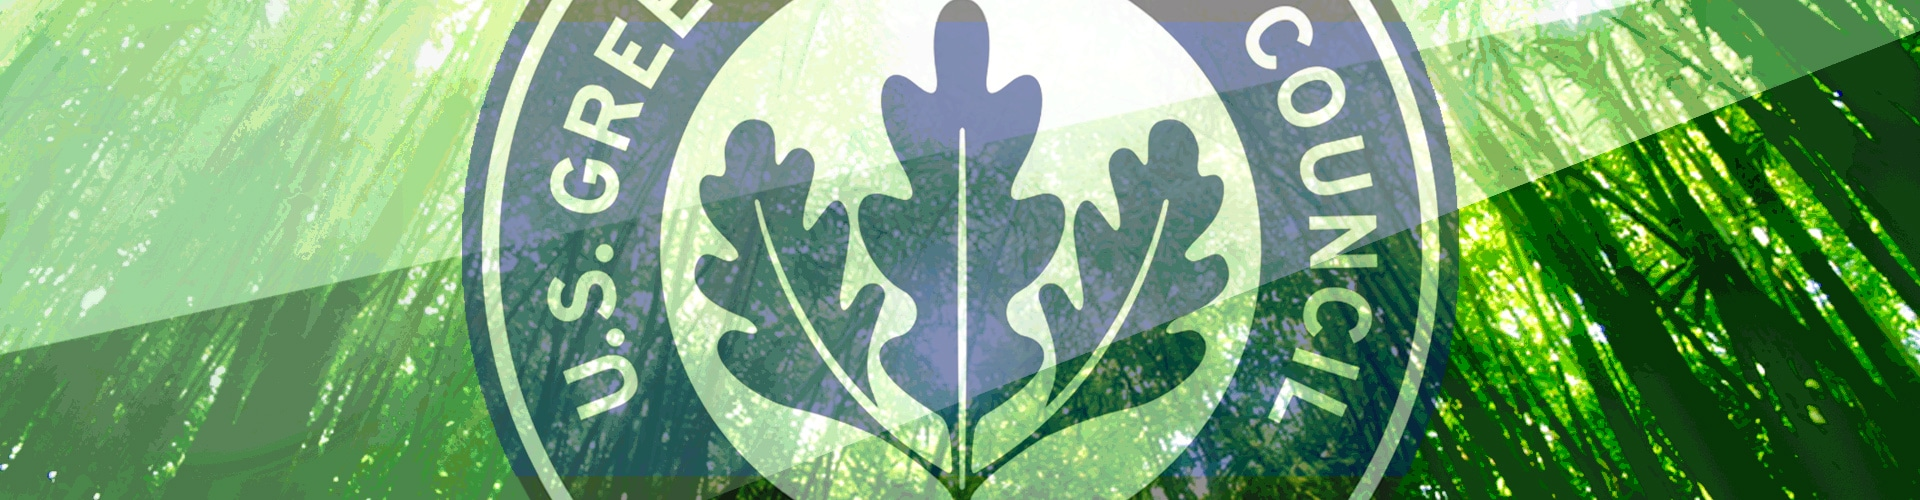 LEED logo Banner